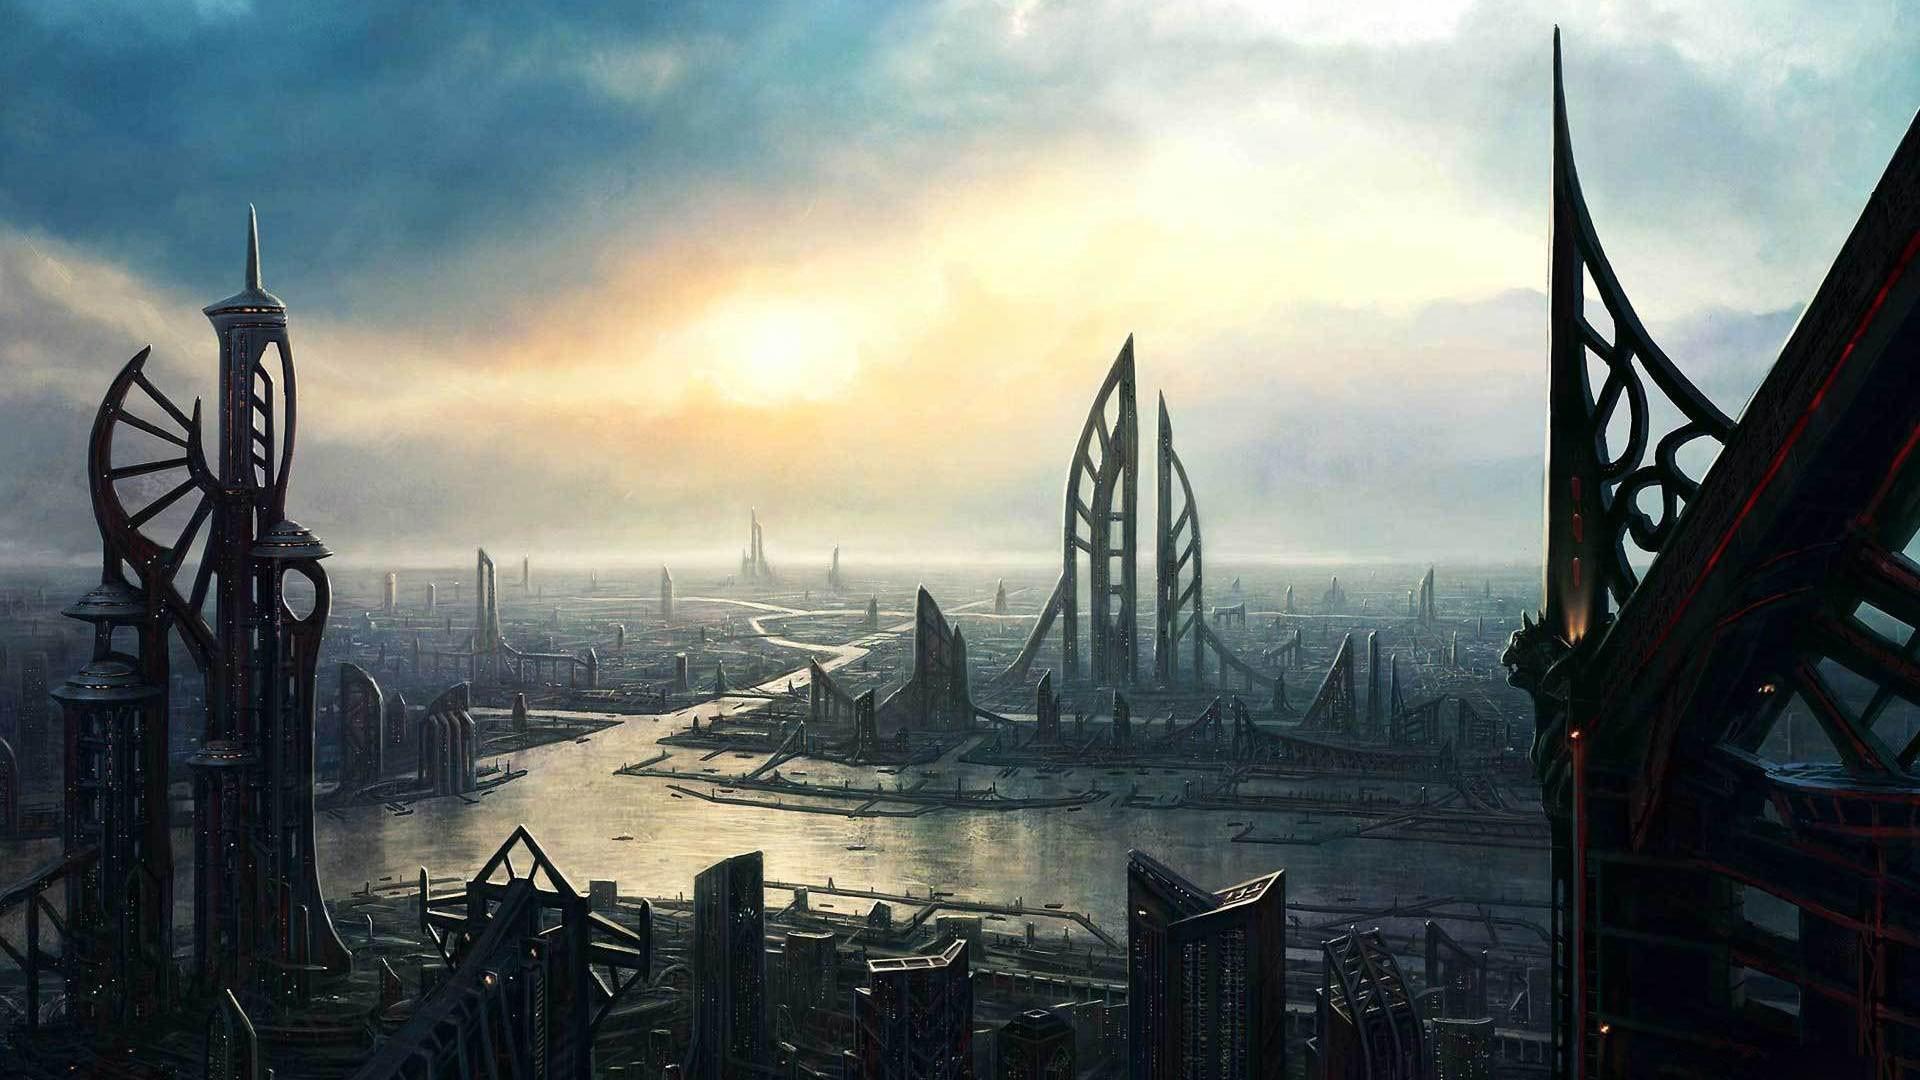 https://newevolutiondesigns.com/images/freebies/futuristic-city-wallpaper-40.jpg    // World // Sci-Fi   Pinterest   Environment concept art, …